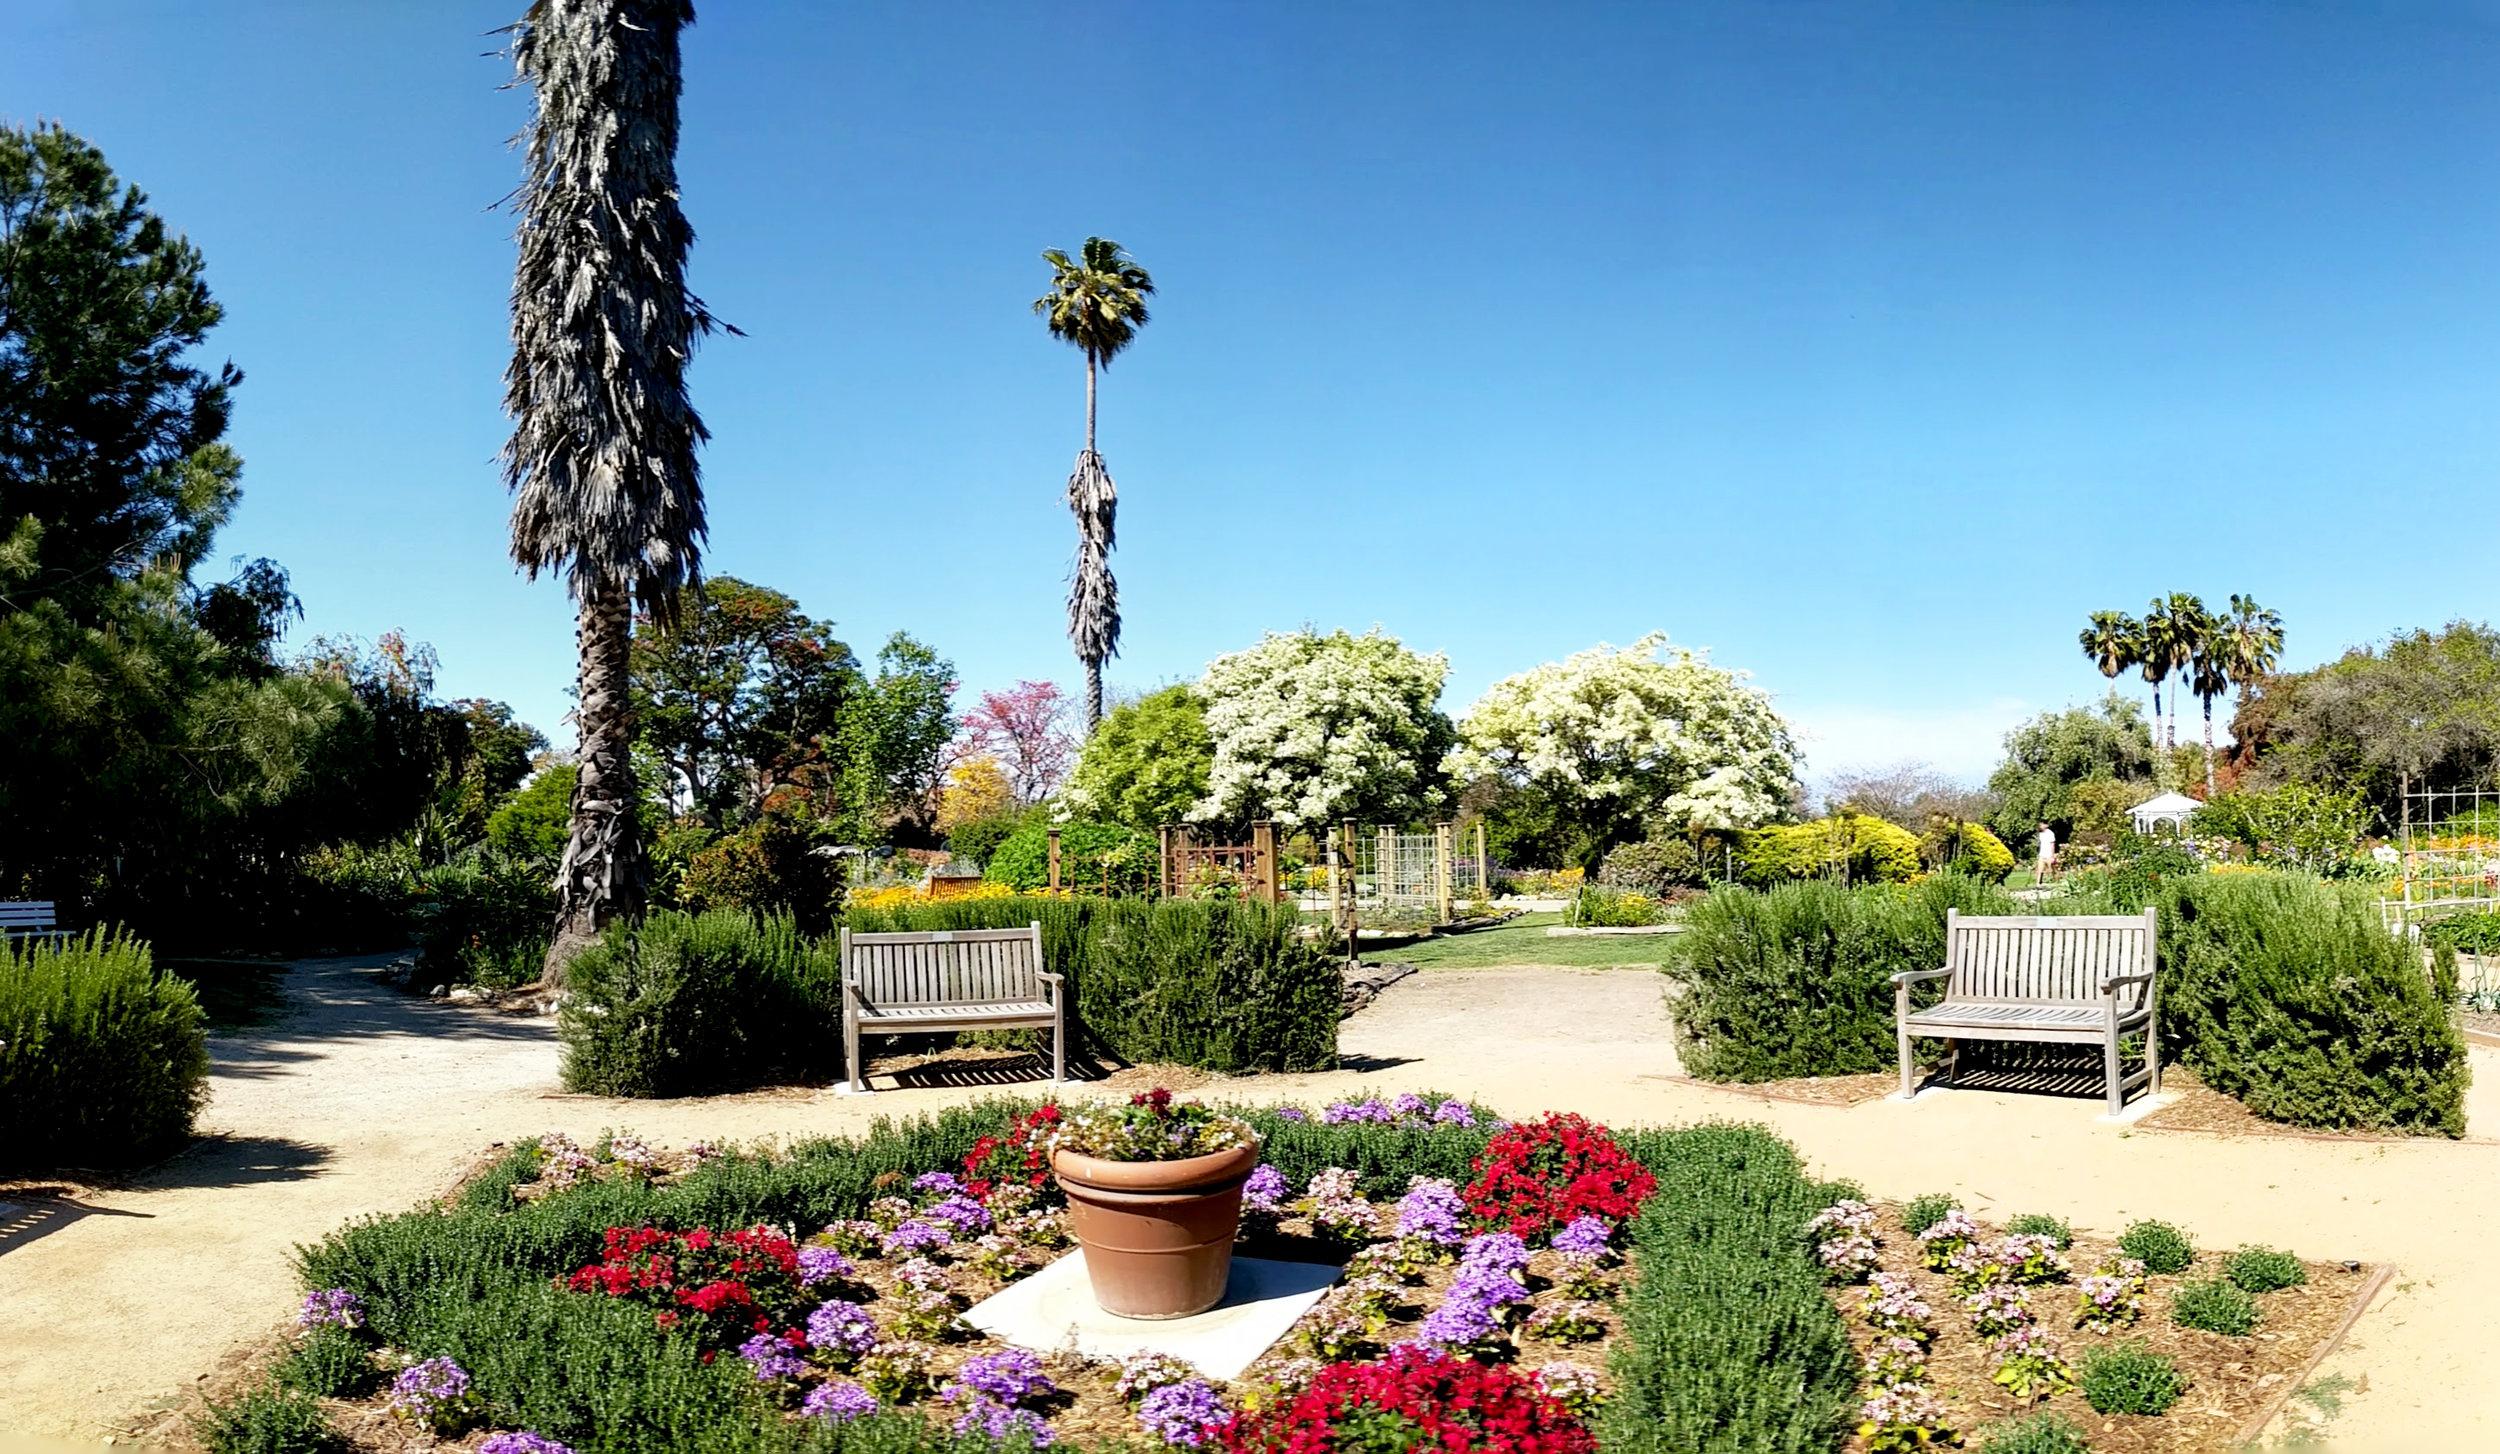 Botanic Garden flowers